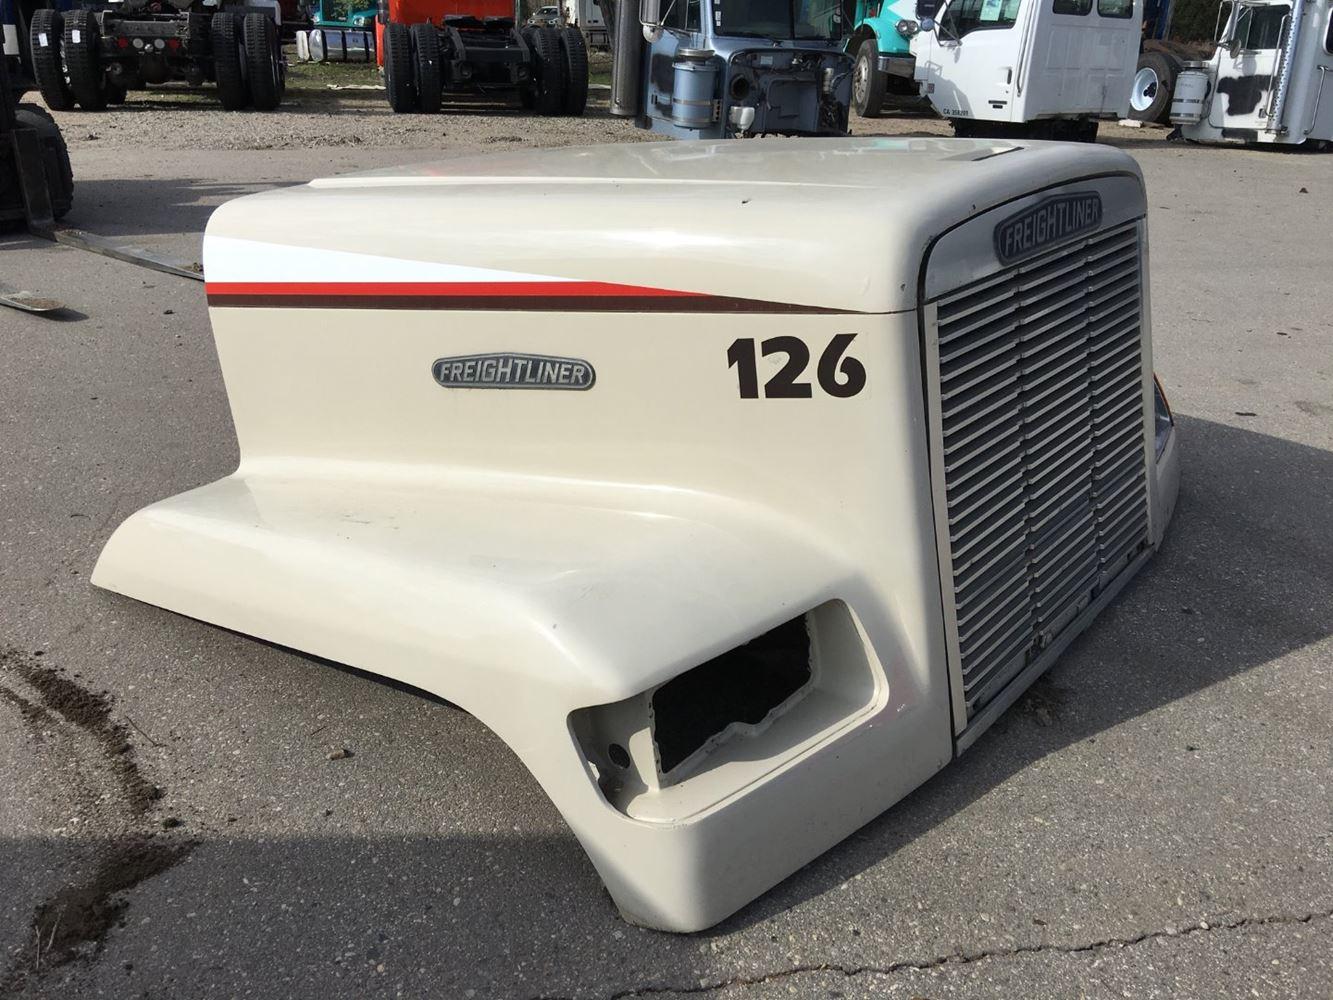 Freightliner Fld120 Hood : Freightliner fld sfa stock p hoods tpi